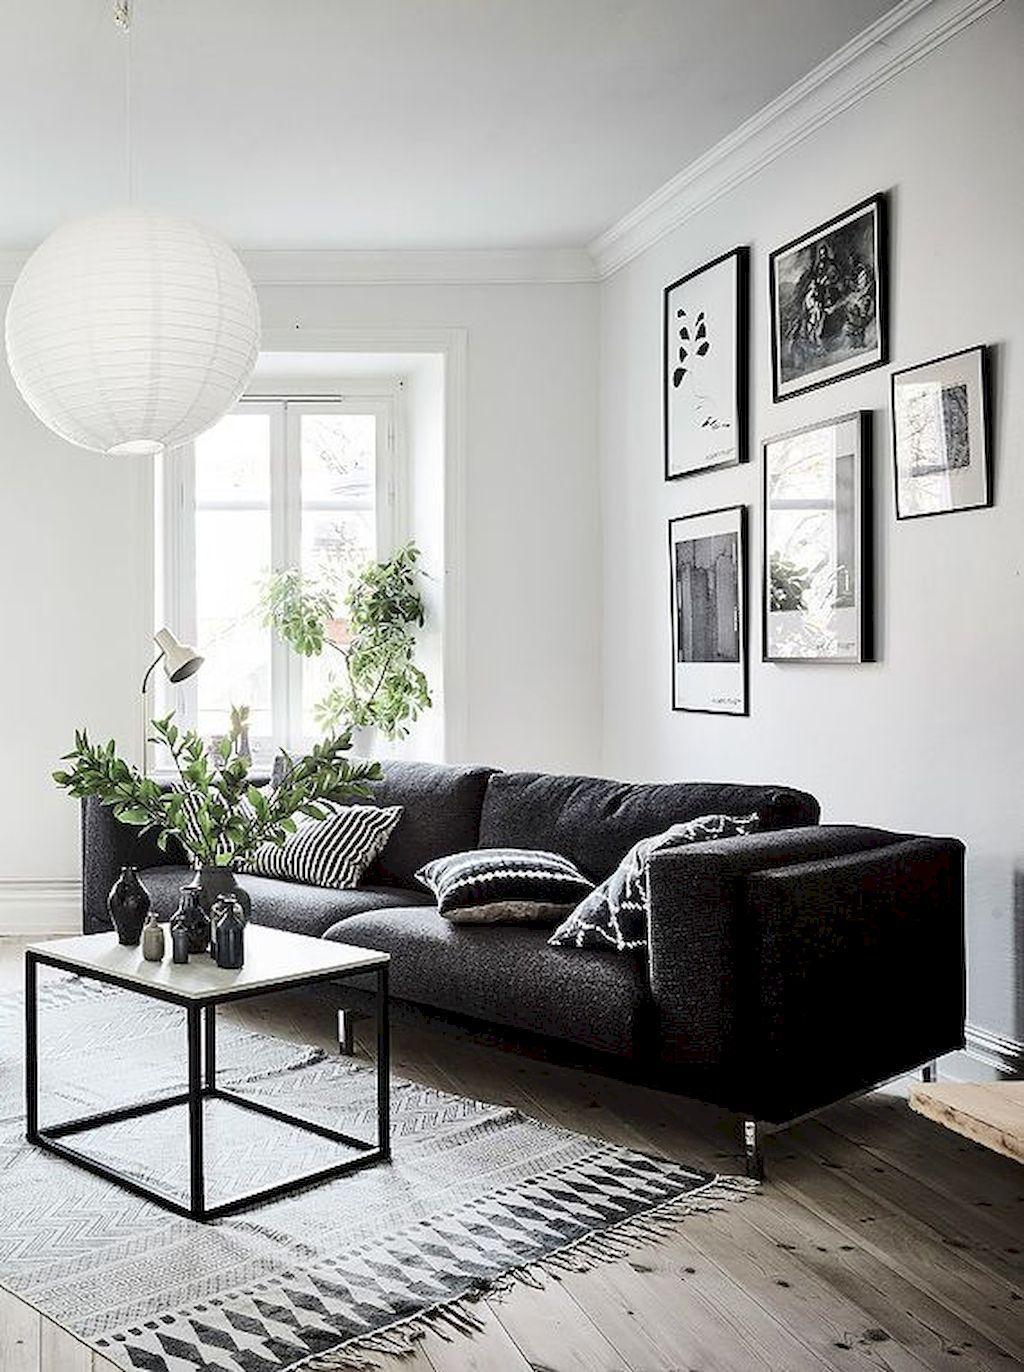 Wall Designs For Living Room Best Interior Design For Living